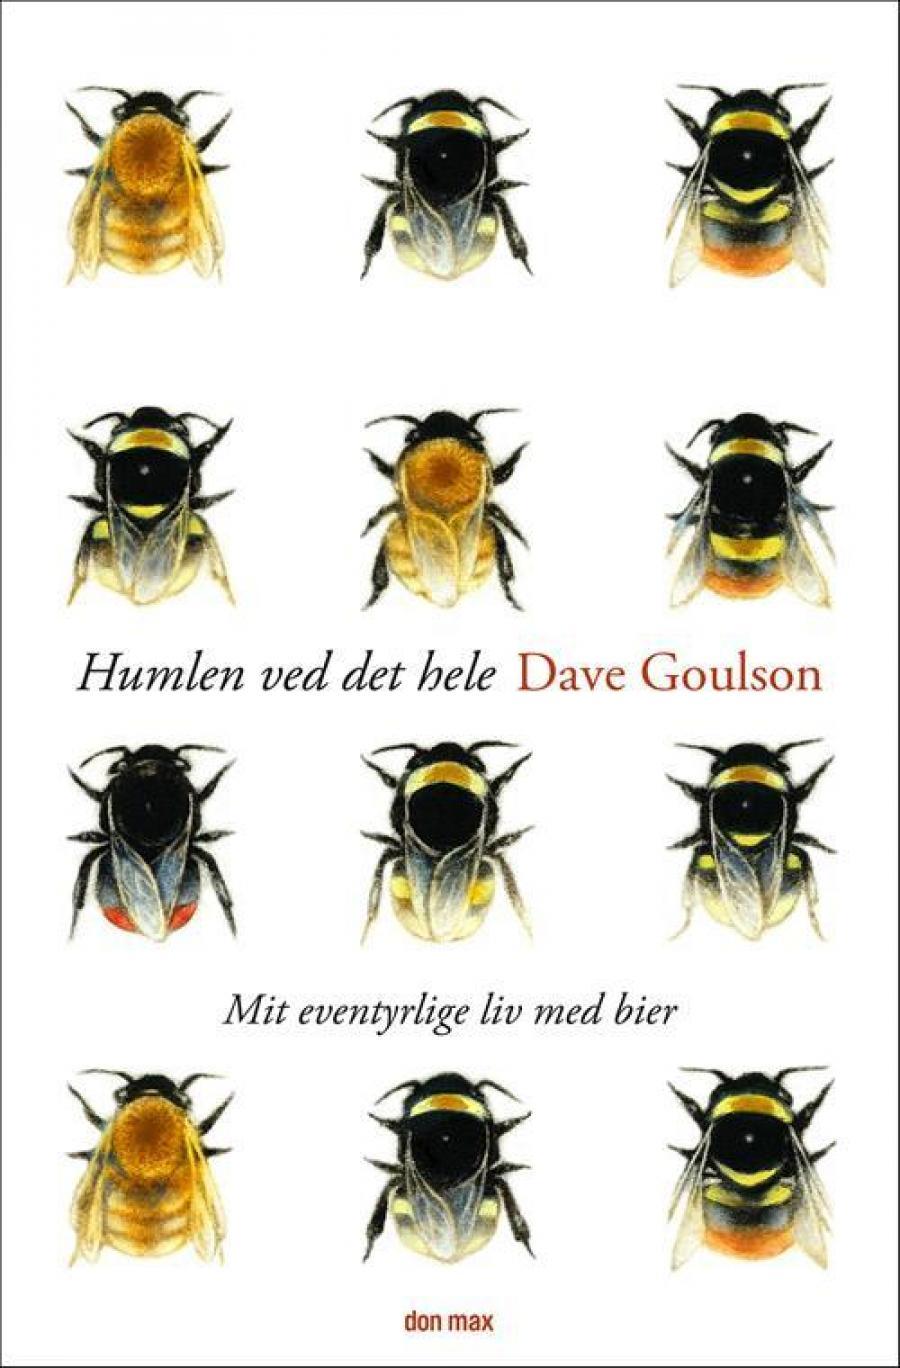 HUmlen ved det hele - David Goulson